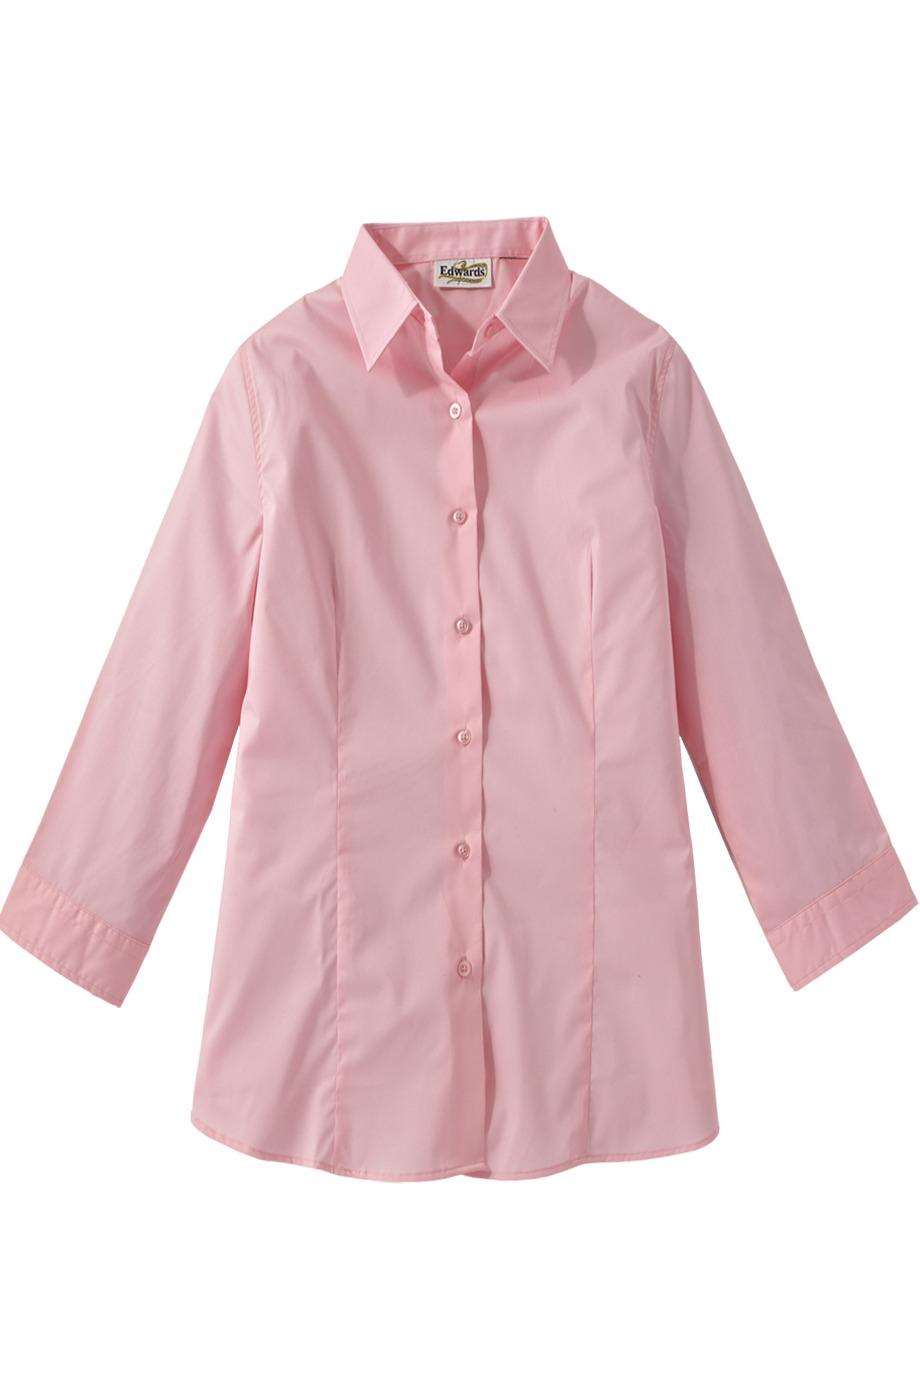 Edwards Garment 5029 - Women's Three Quarter Sleeve ...